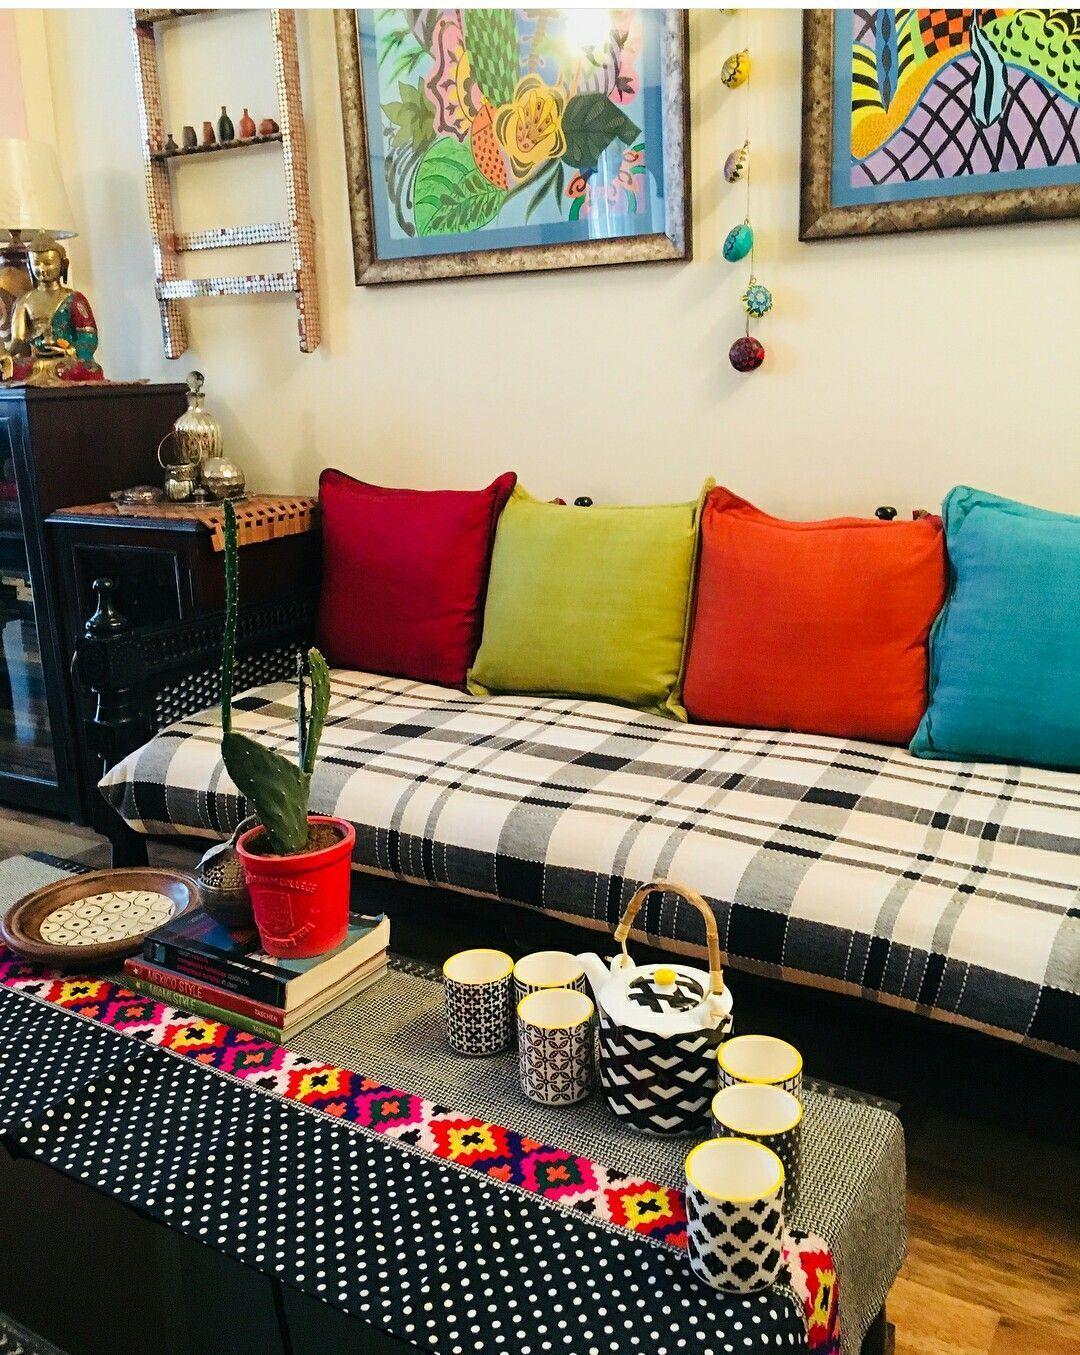 Indian Style Small Bedroom Interior Design Homyracks